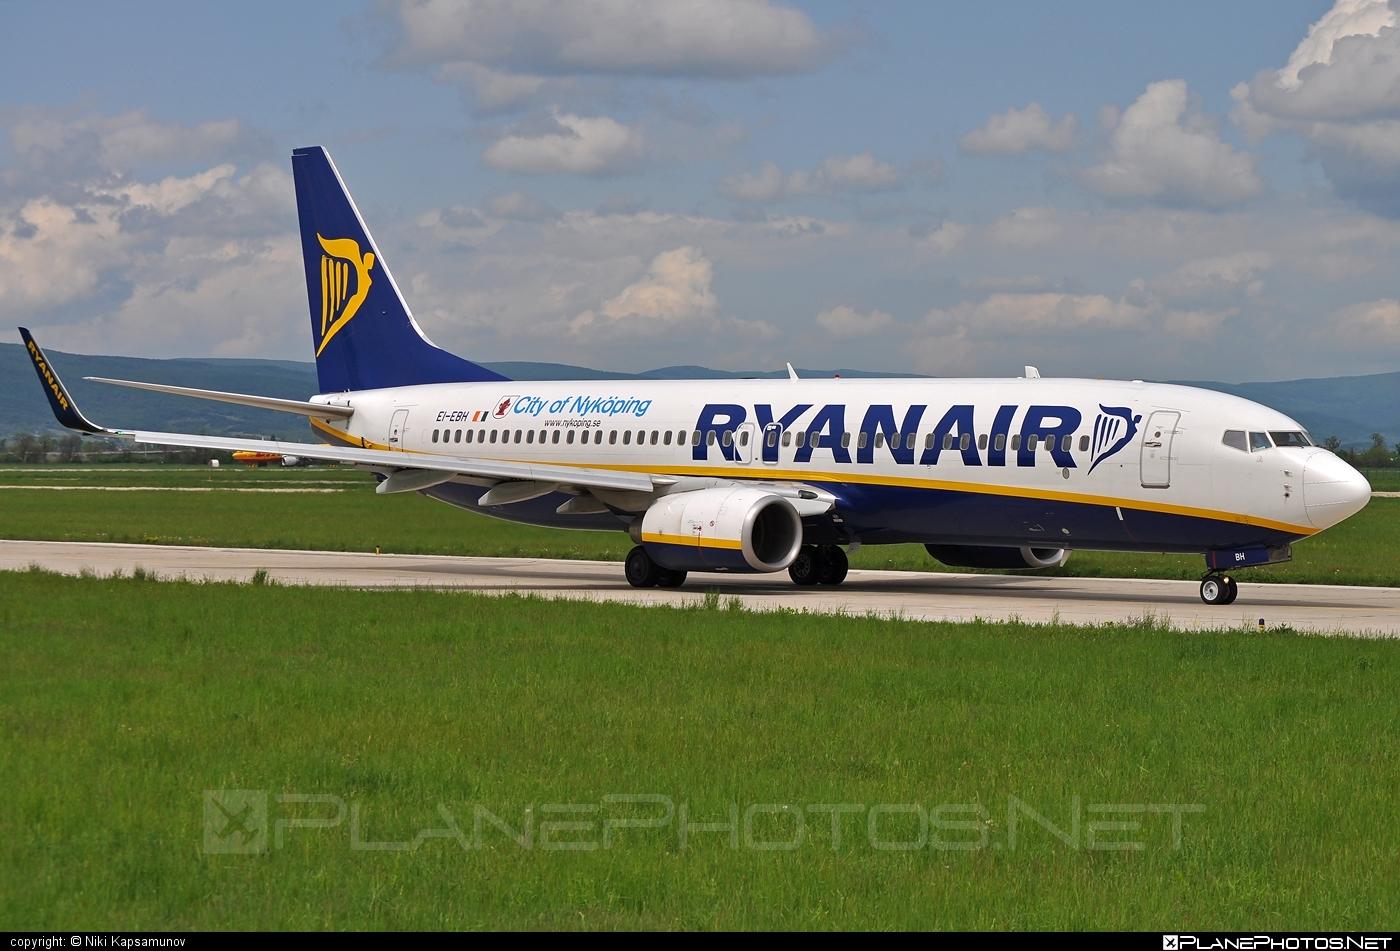 Ryanair Boeing 737-800 - EI-EBH #b737 #b737nextgen #b737ng #boeing #boeing737 #ryanair